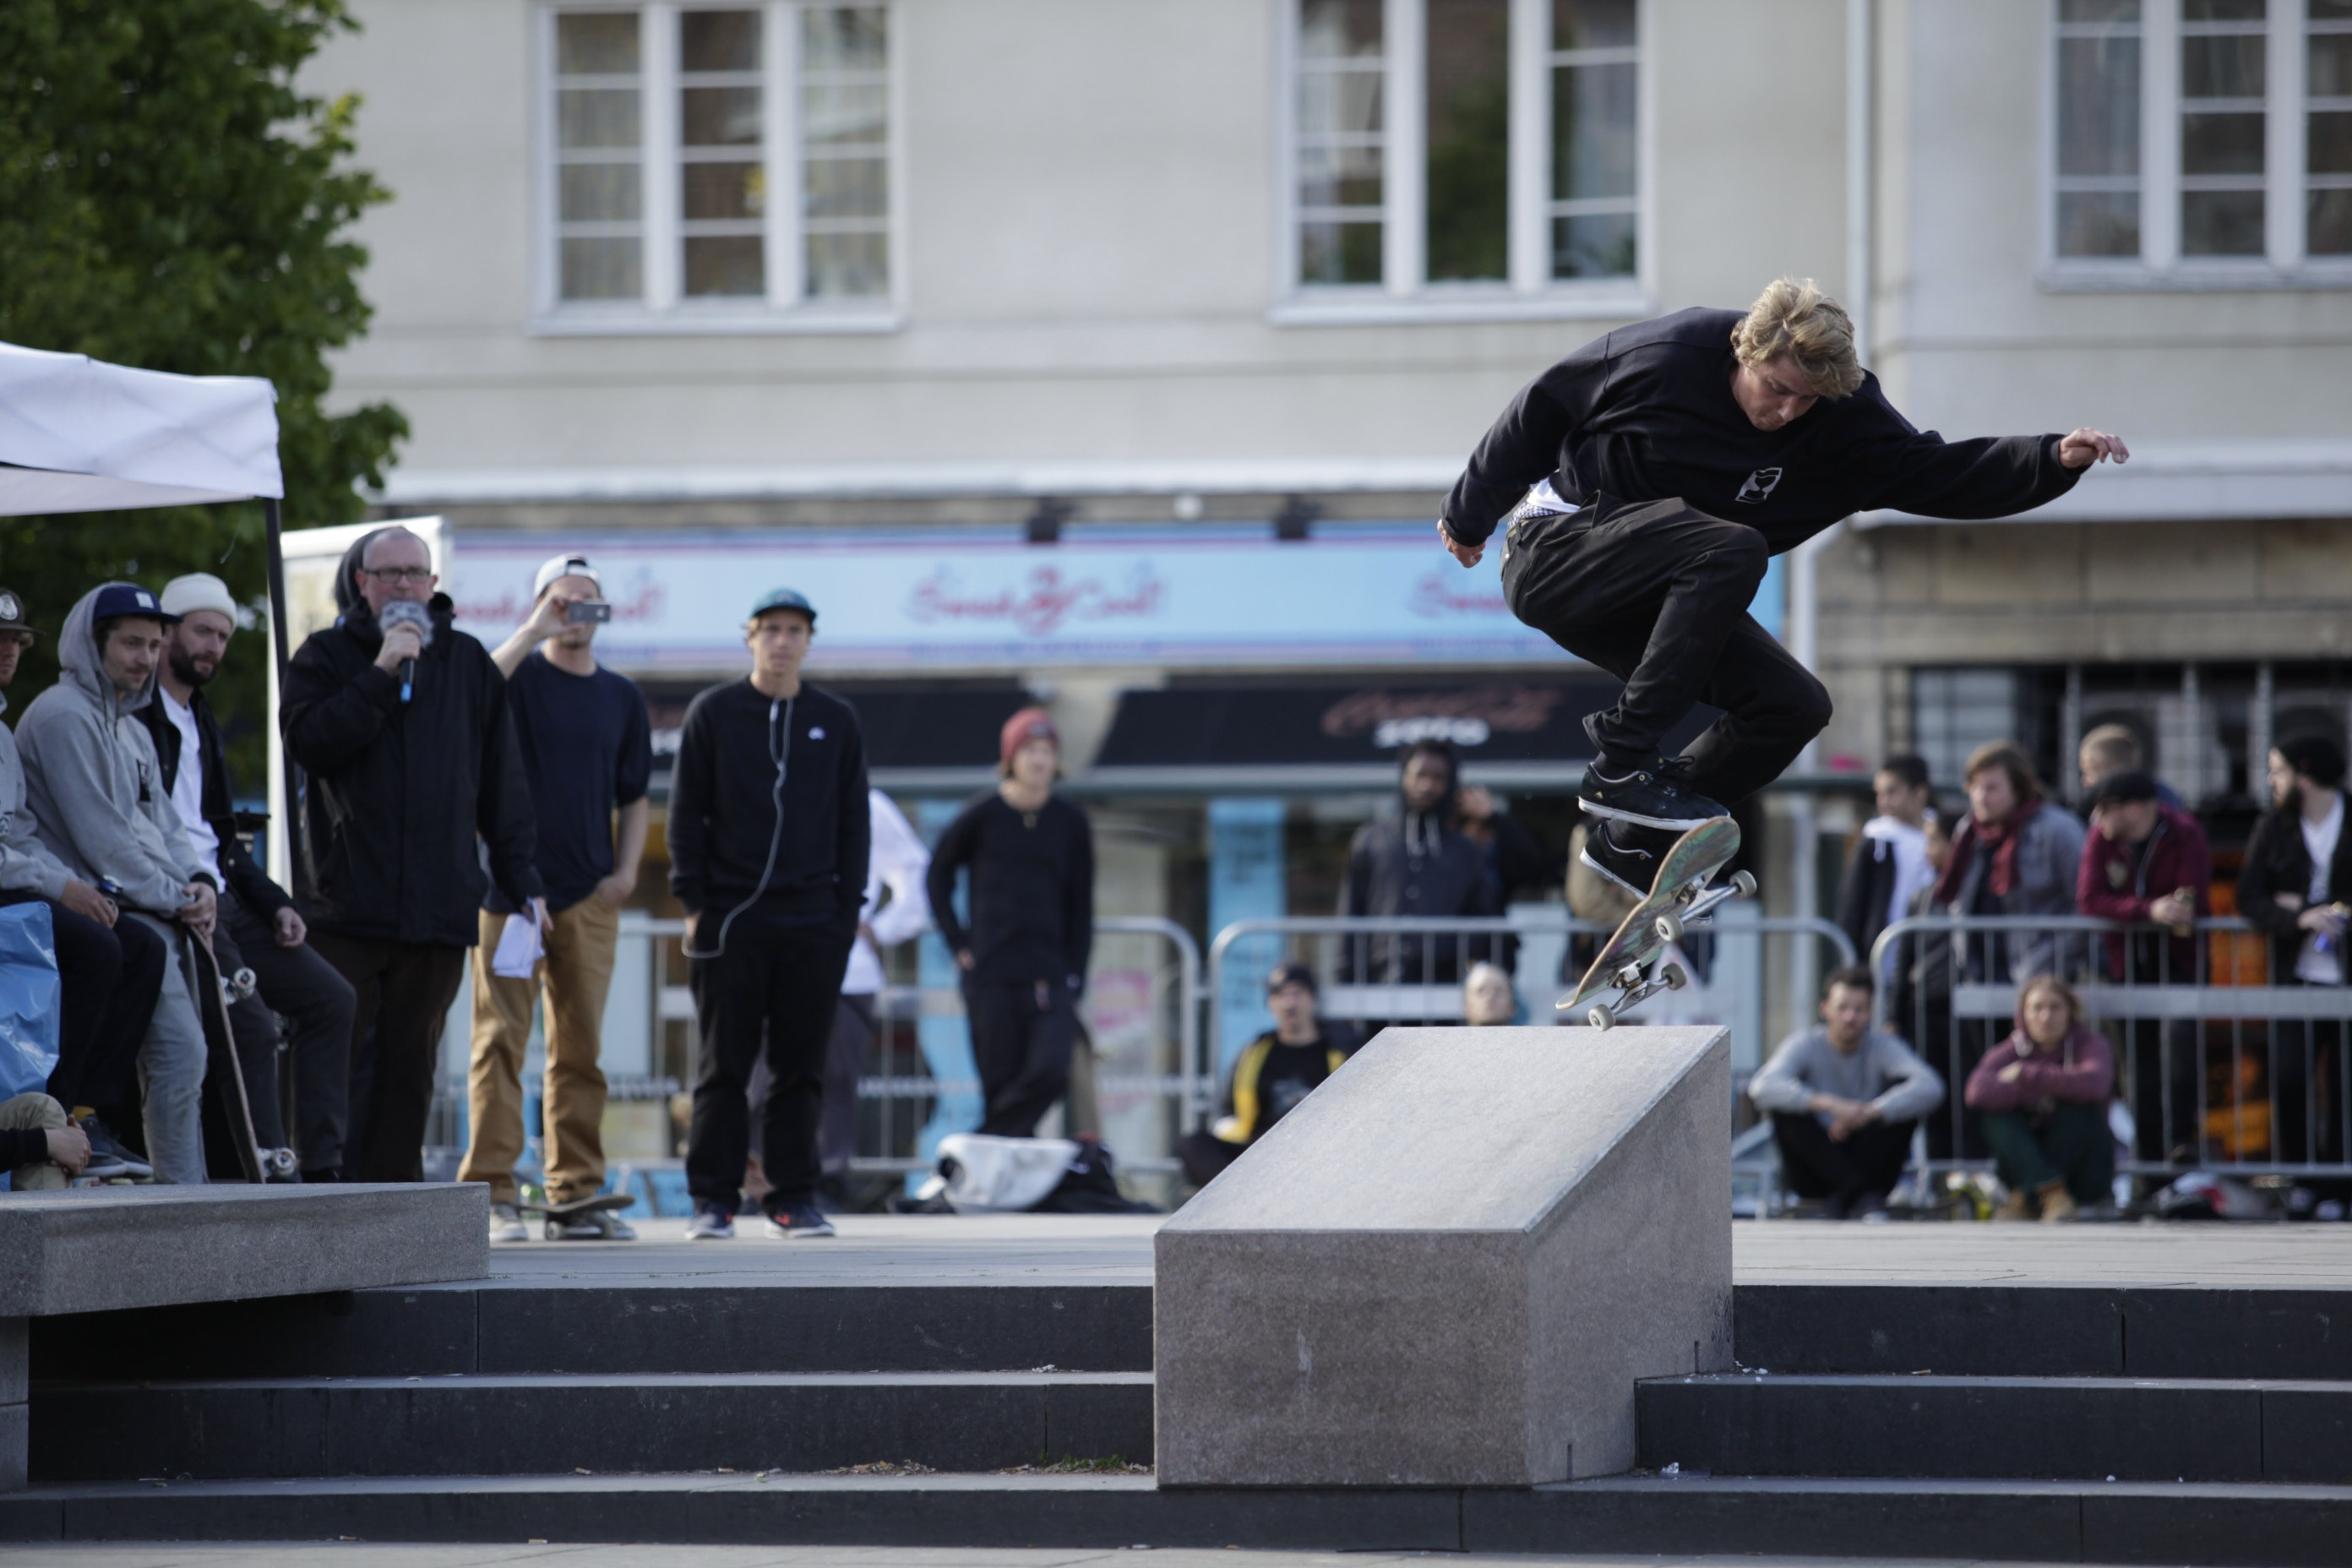 Nisse Ingemarsson – Hardflip 5-0